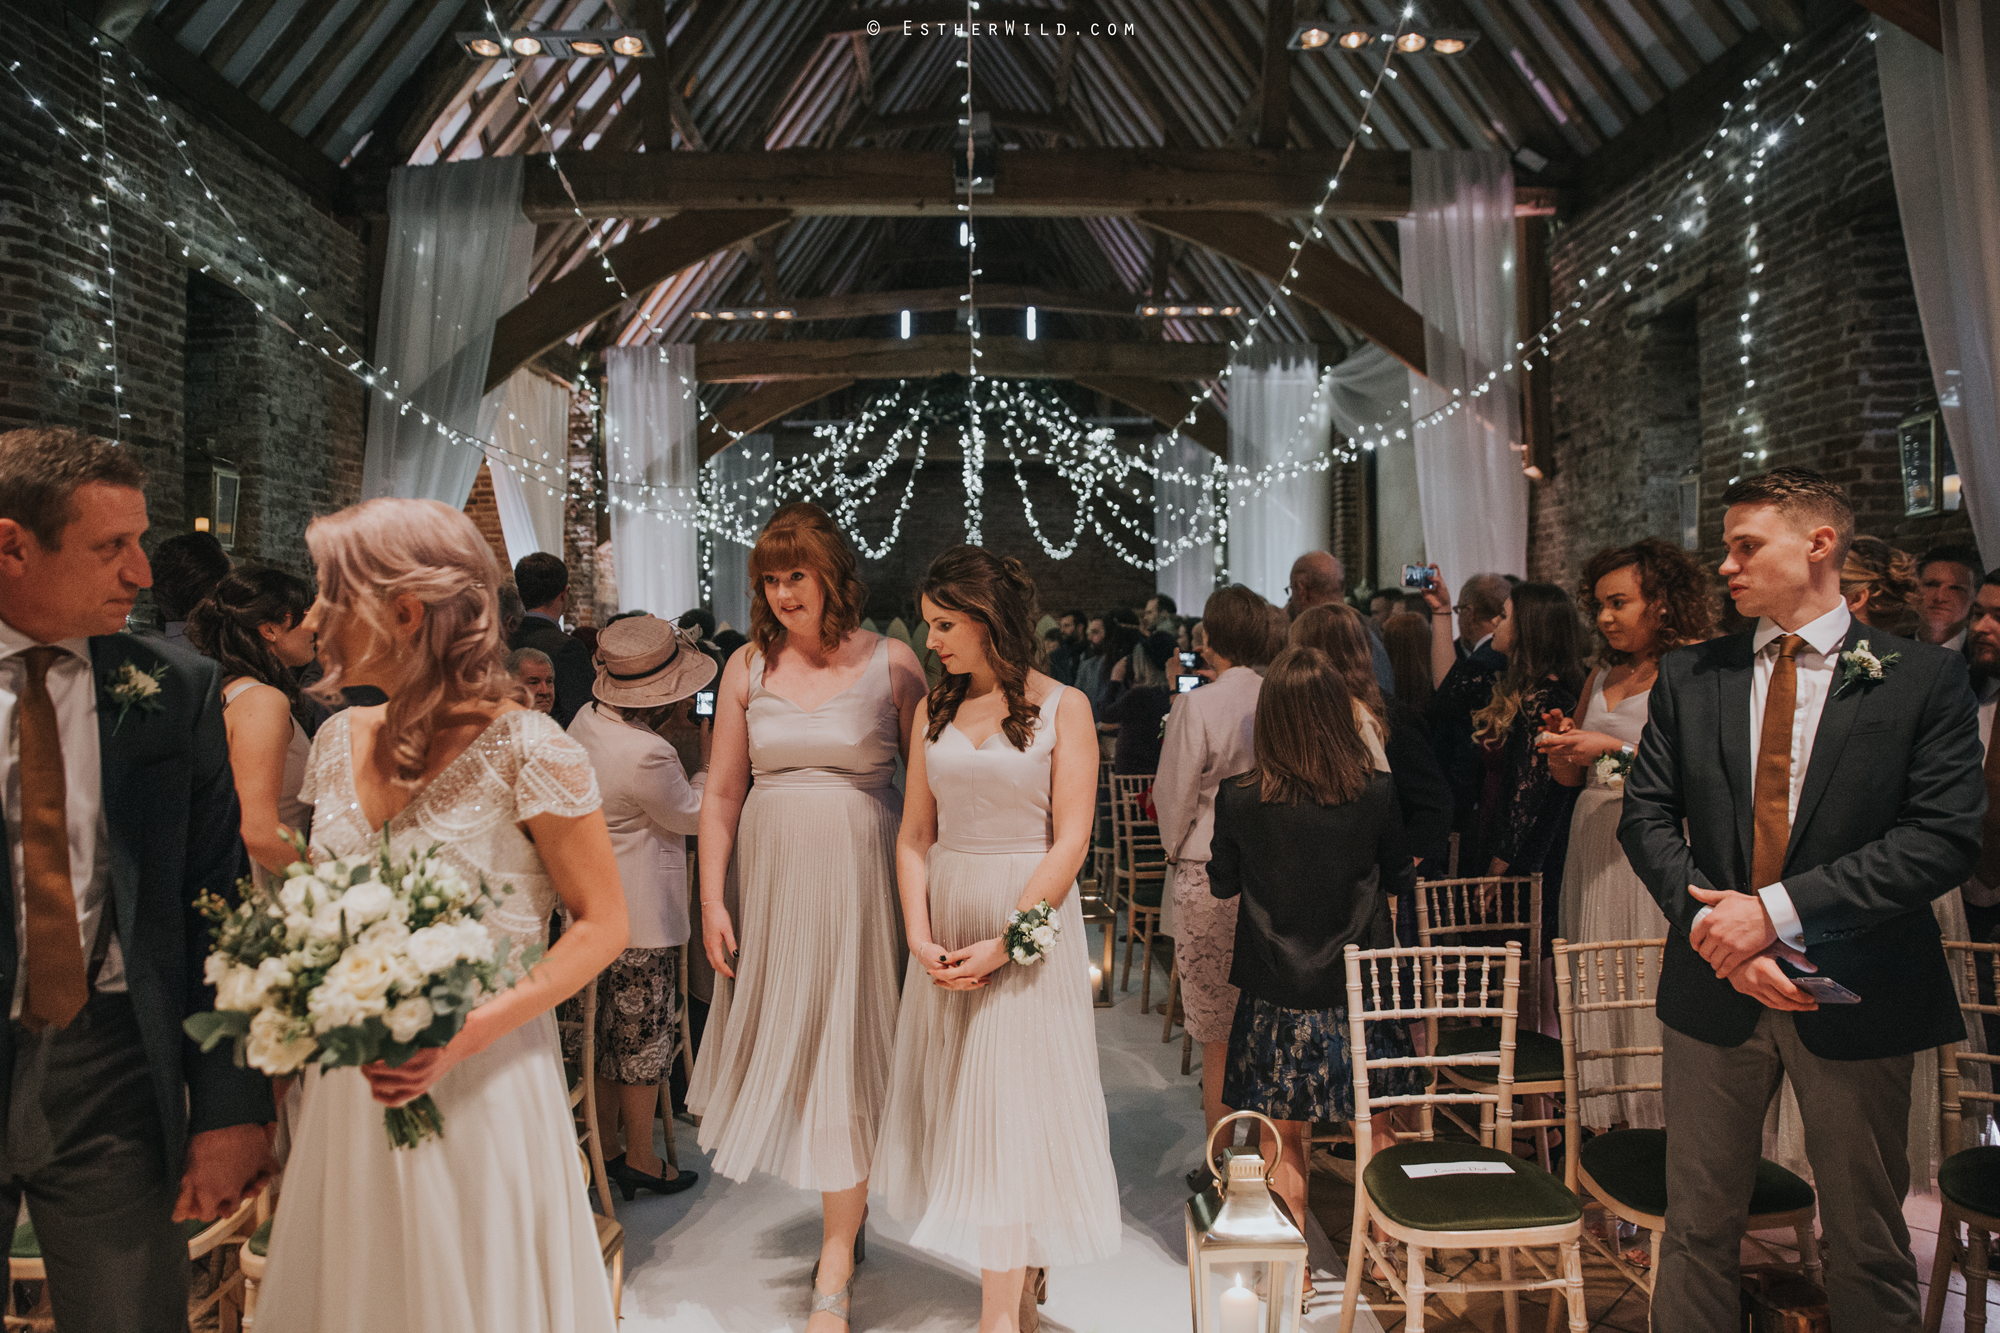 Elms_Barn_Weddings_Suffolk_Photographer_Copyright_Esther_Wild_IMG_1095.jpg